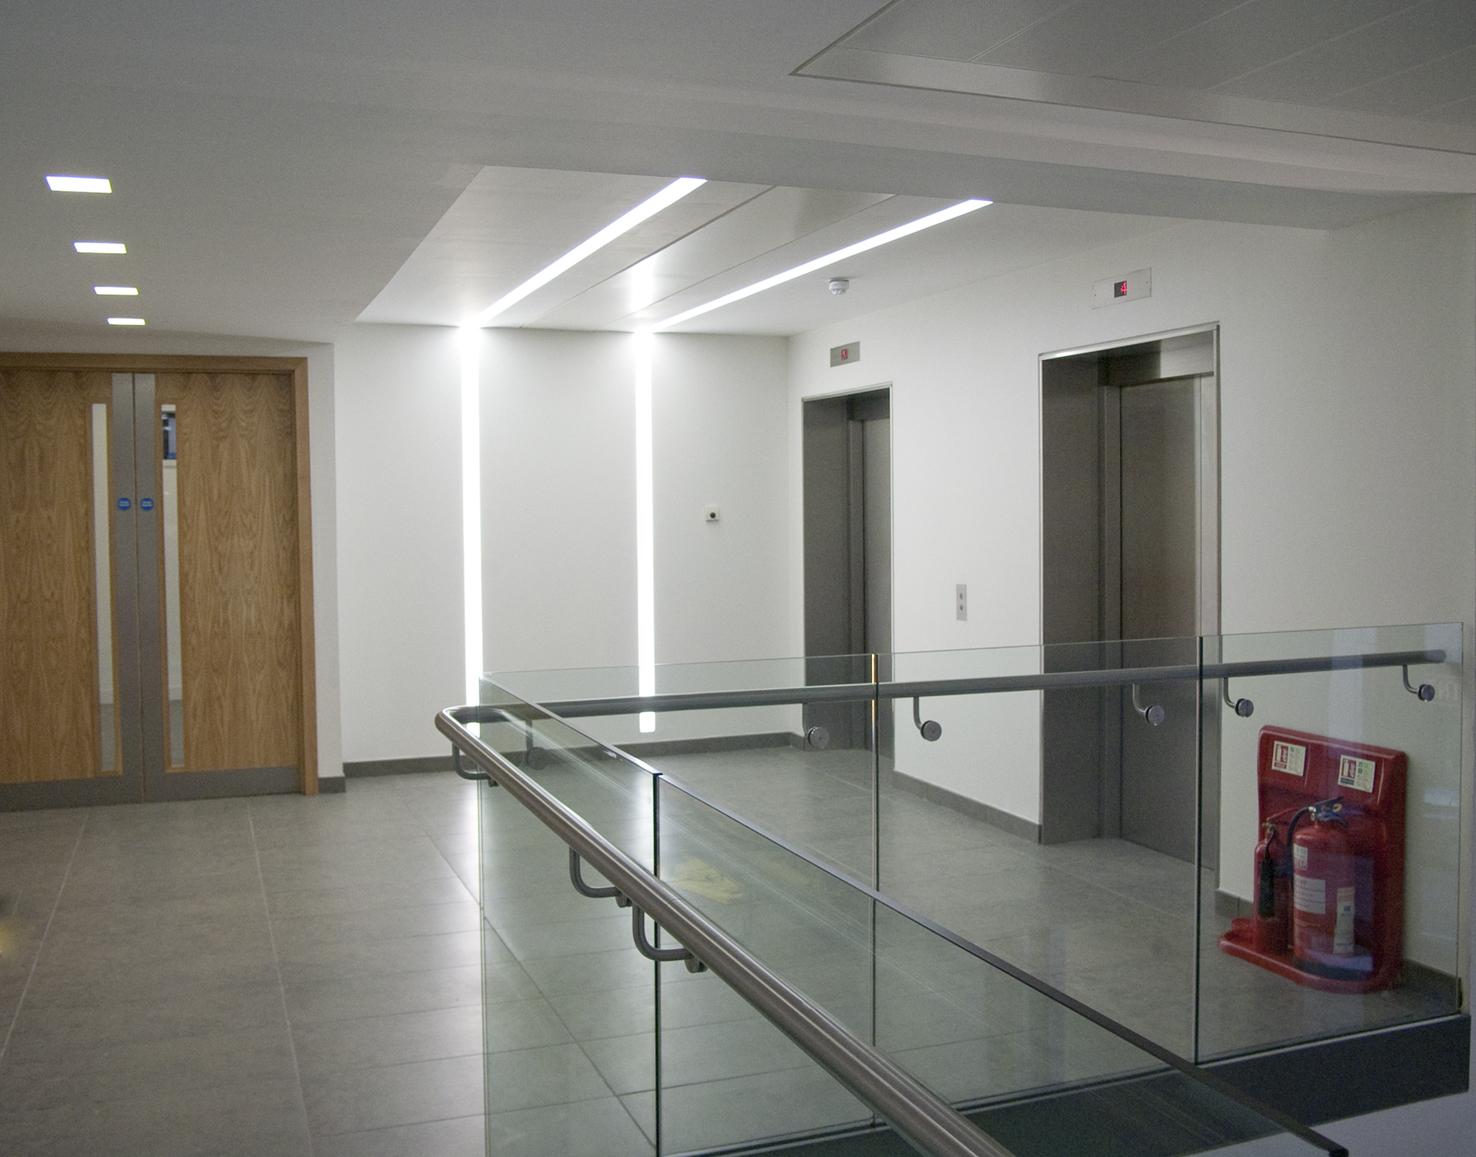 KSLD_Spectrum Building_Lobby 1st floor.jpg